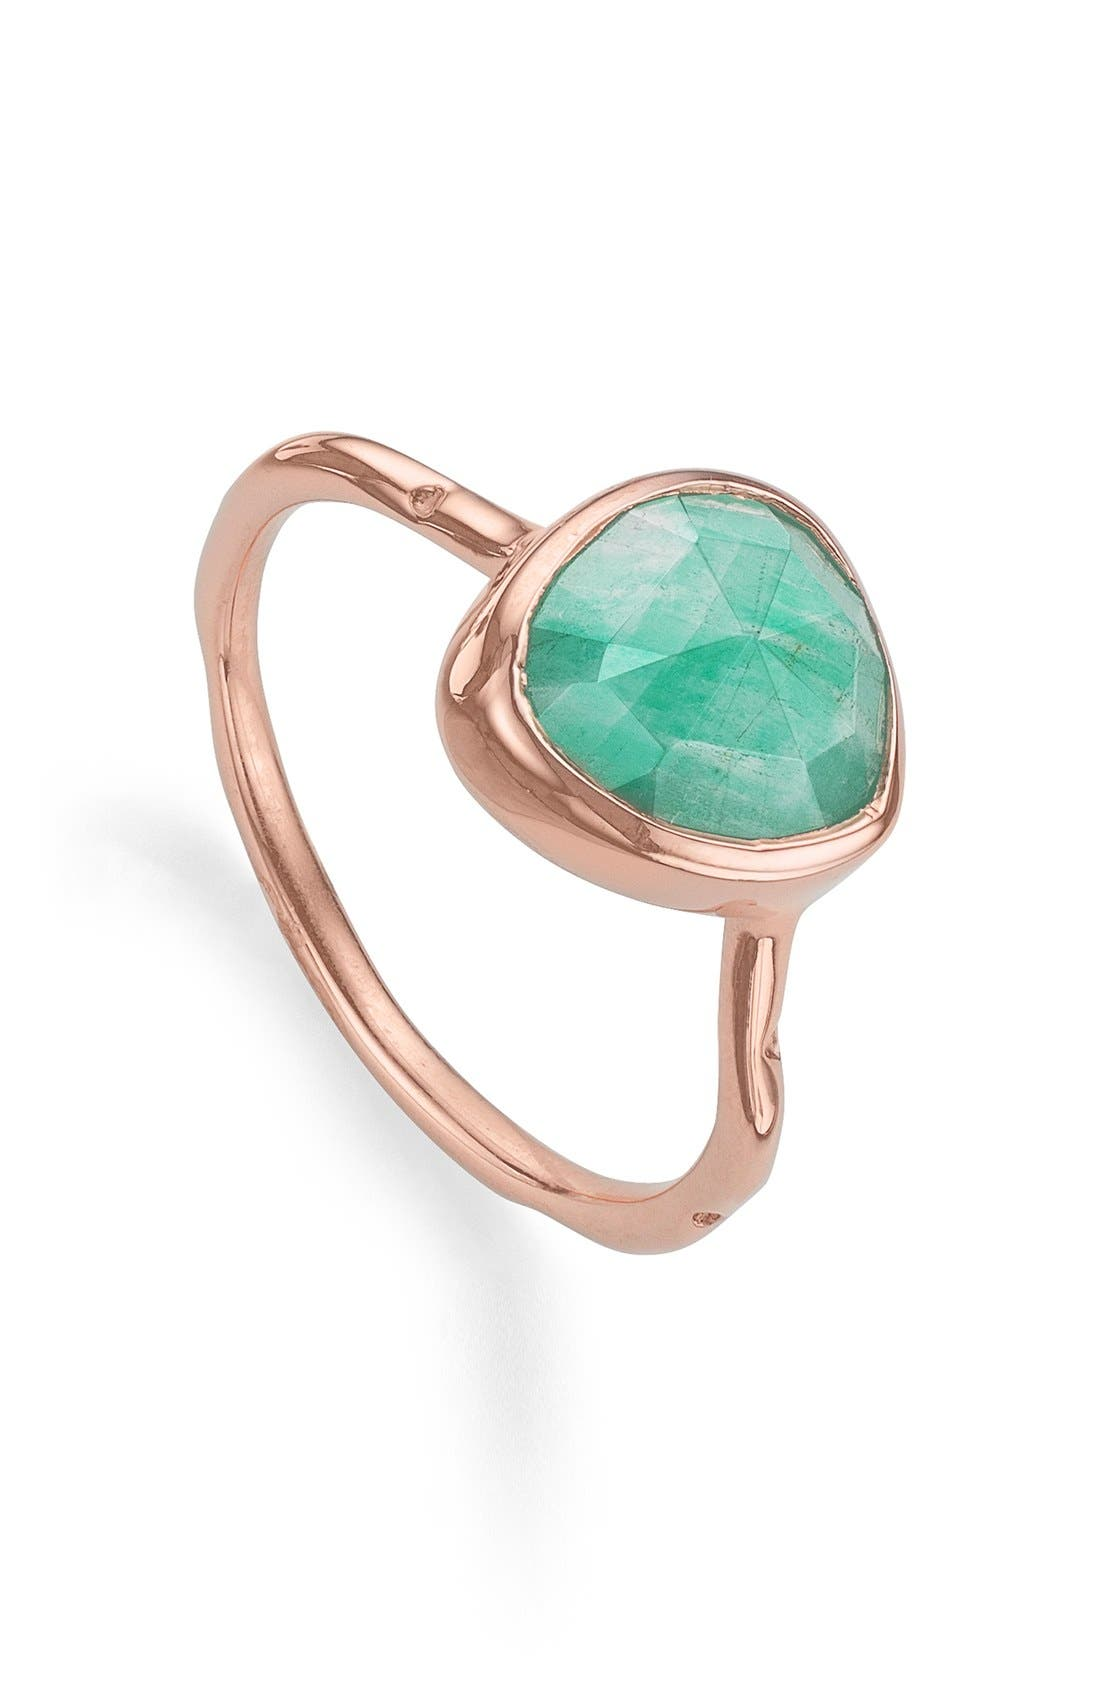 Alternate Image 1 Selected - Monica Vinader 'Siren' Semiprecious Stone Stacking Ring